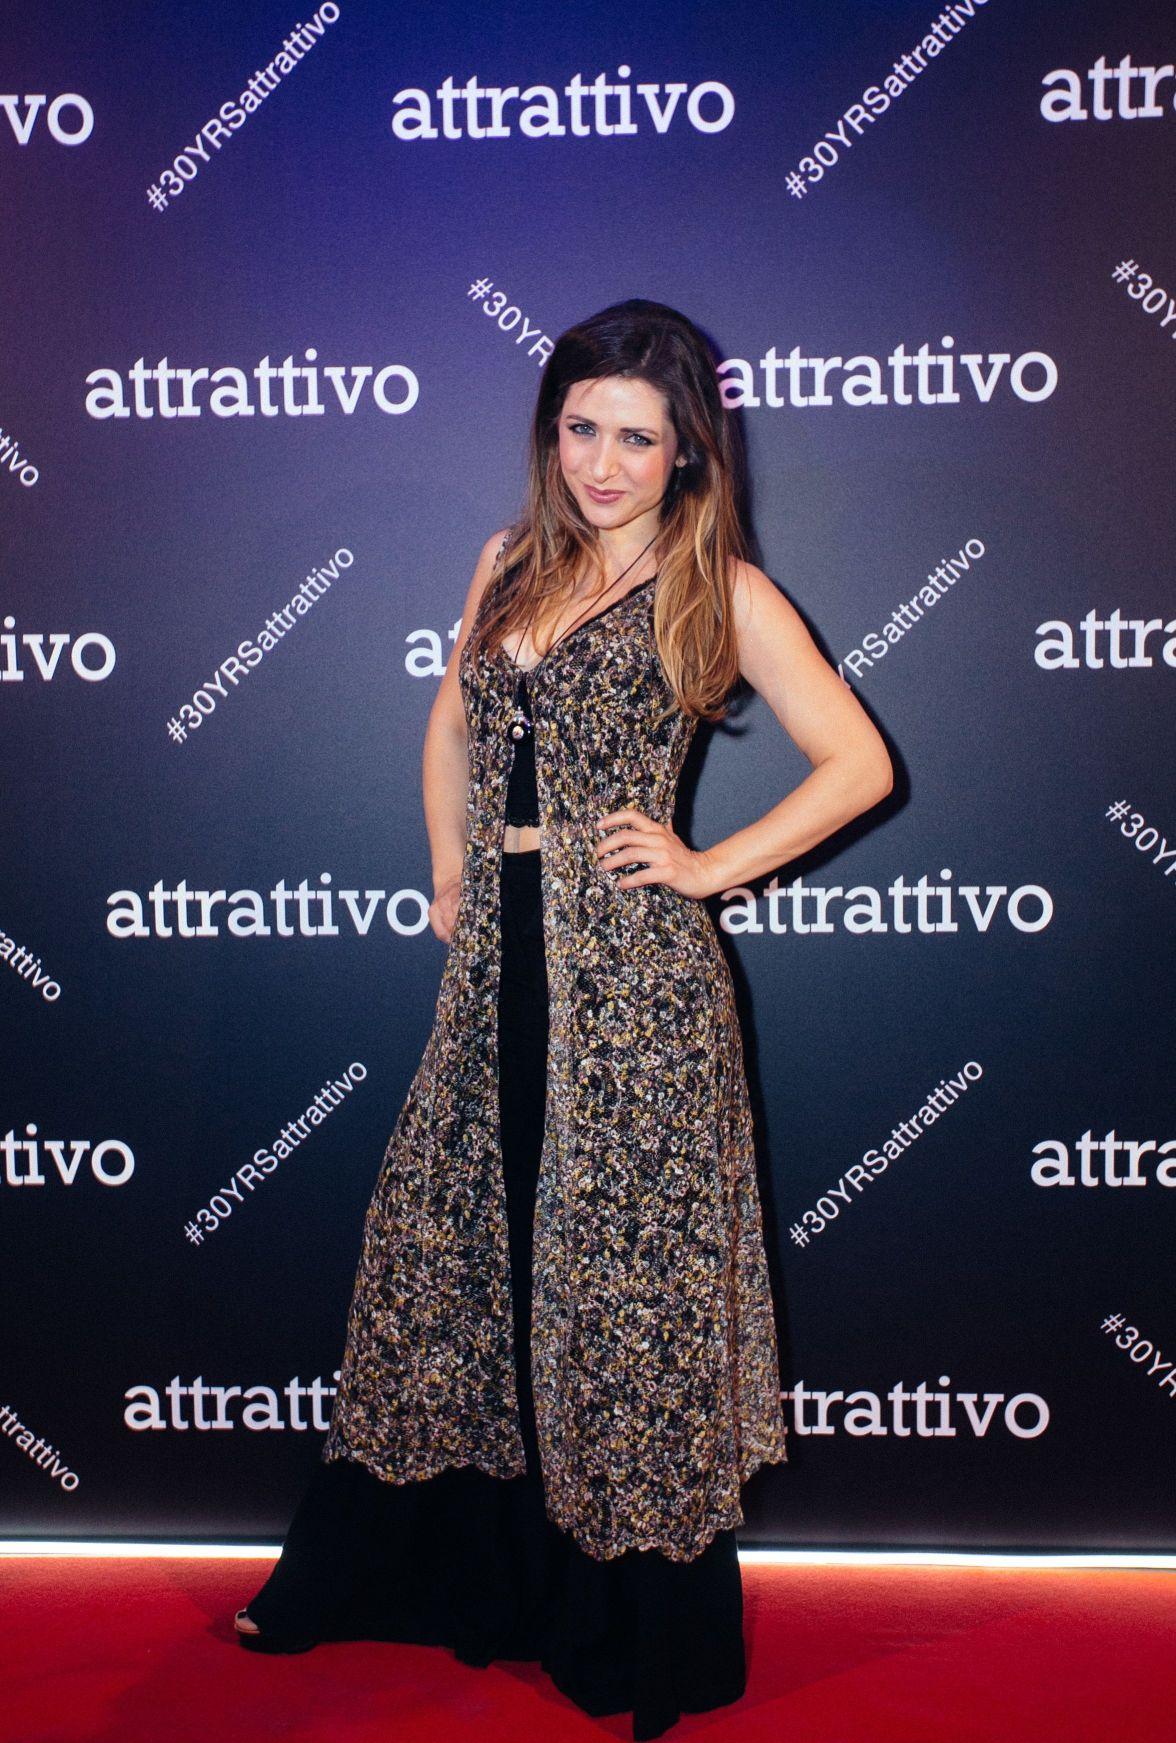 9054fafcafa5 Κατάλογοι Ρούχων   Τάσεις Μόδας - attrattivo - attrattivo party  The ...